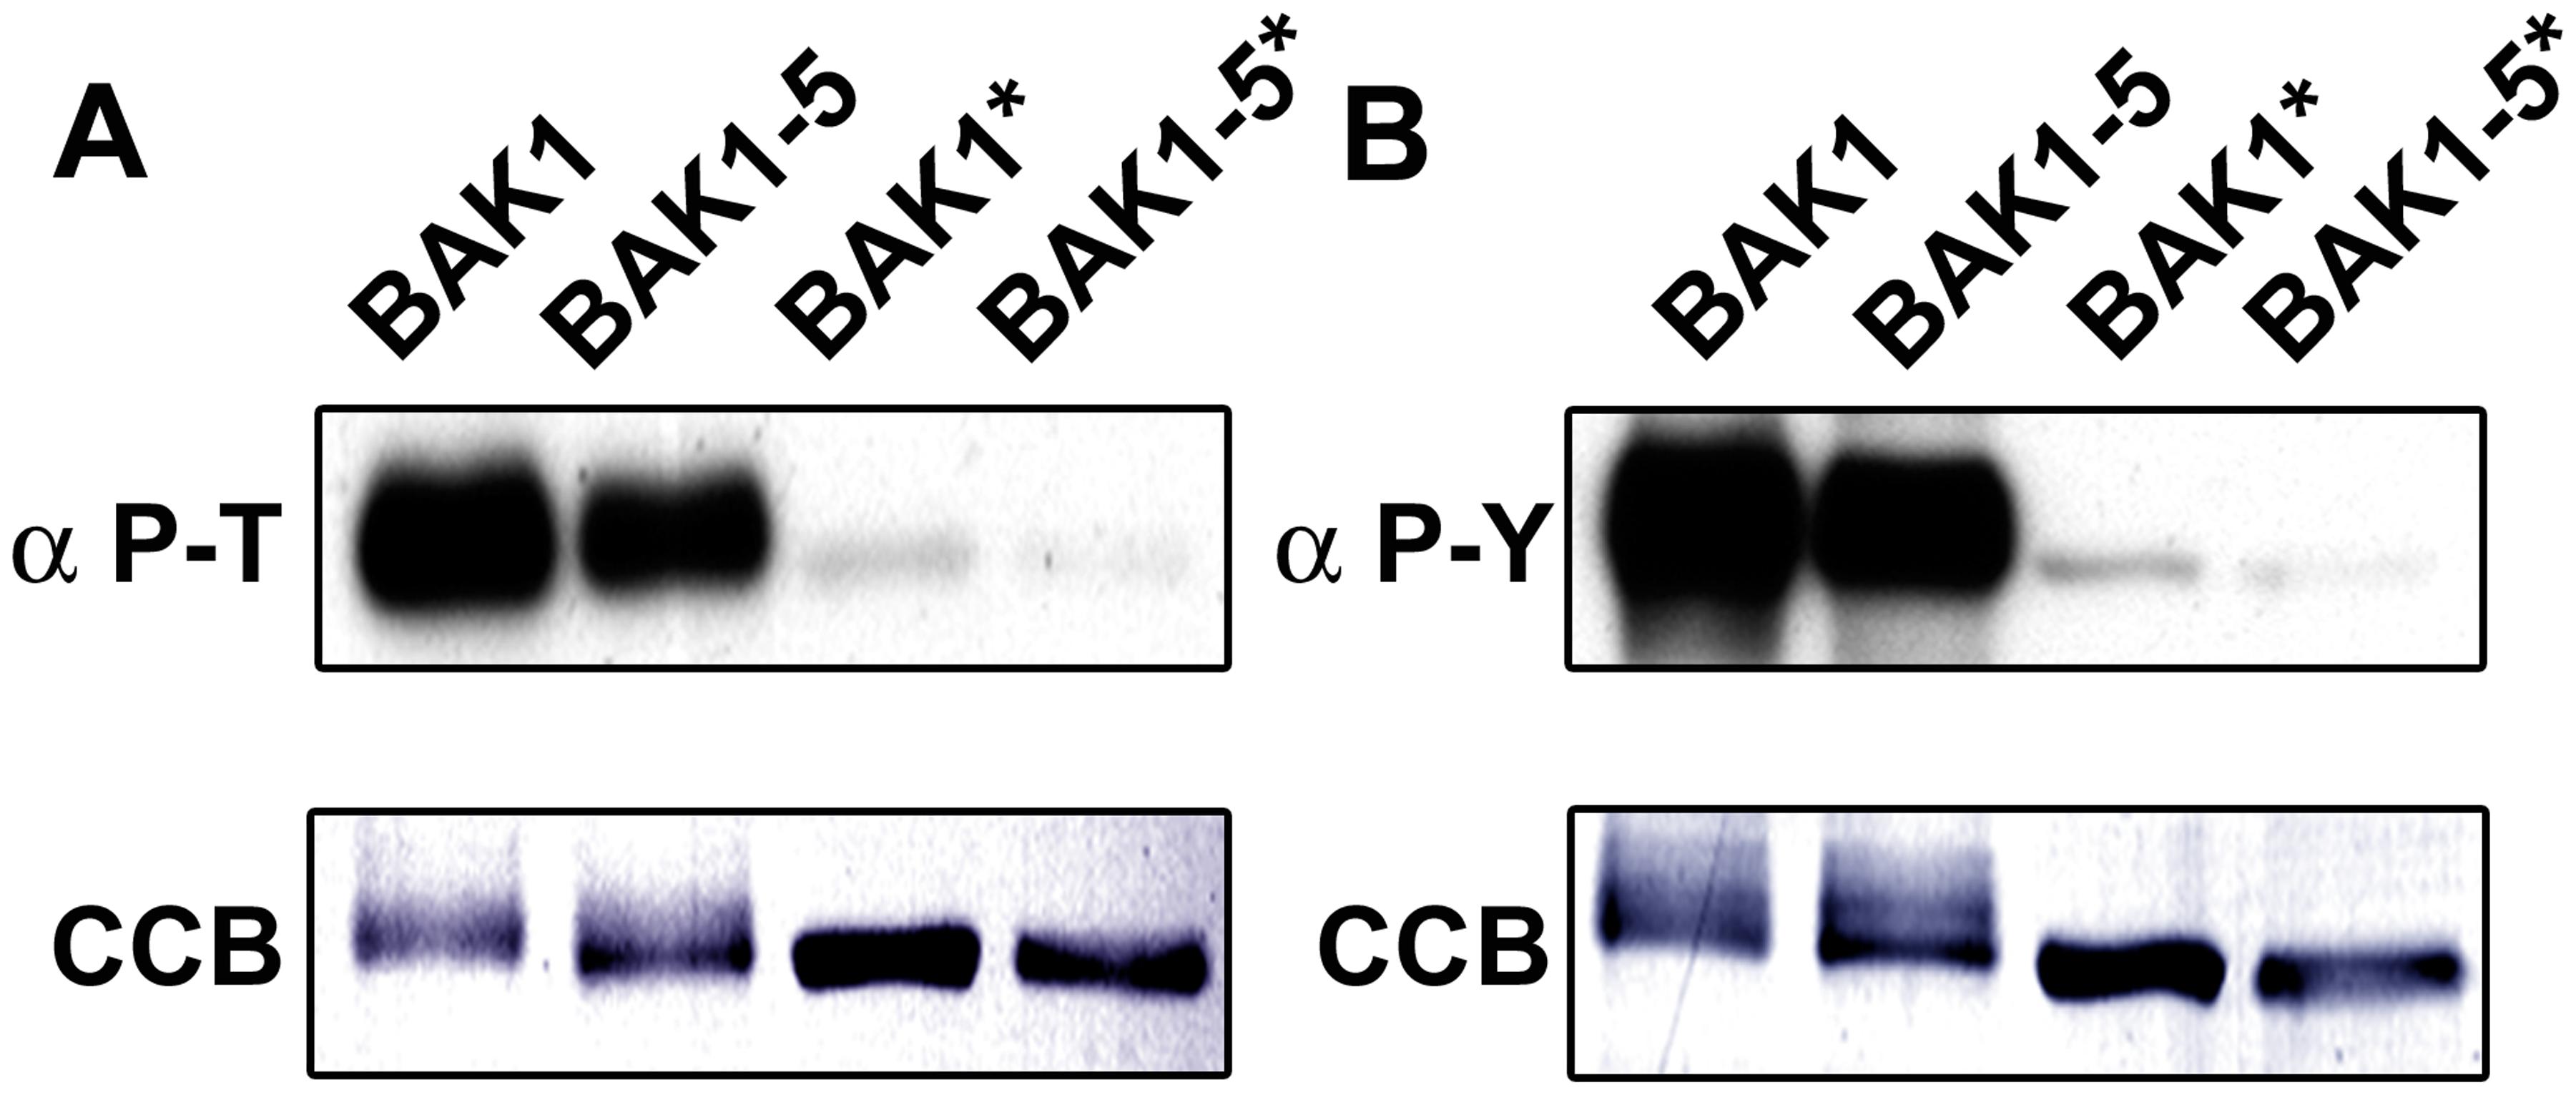 BAK1-5 is a hypoactive kinase <i>in vitro.</i>